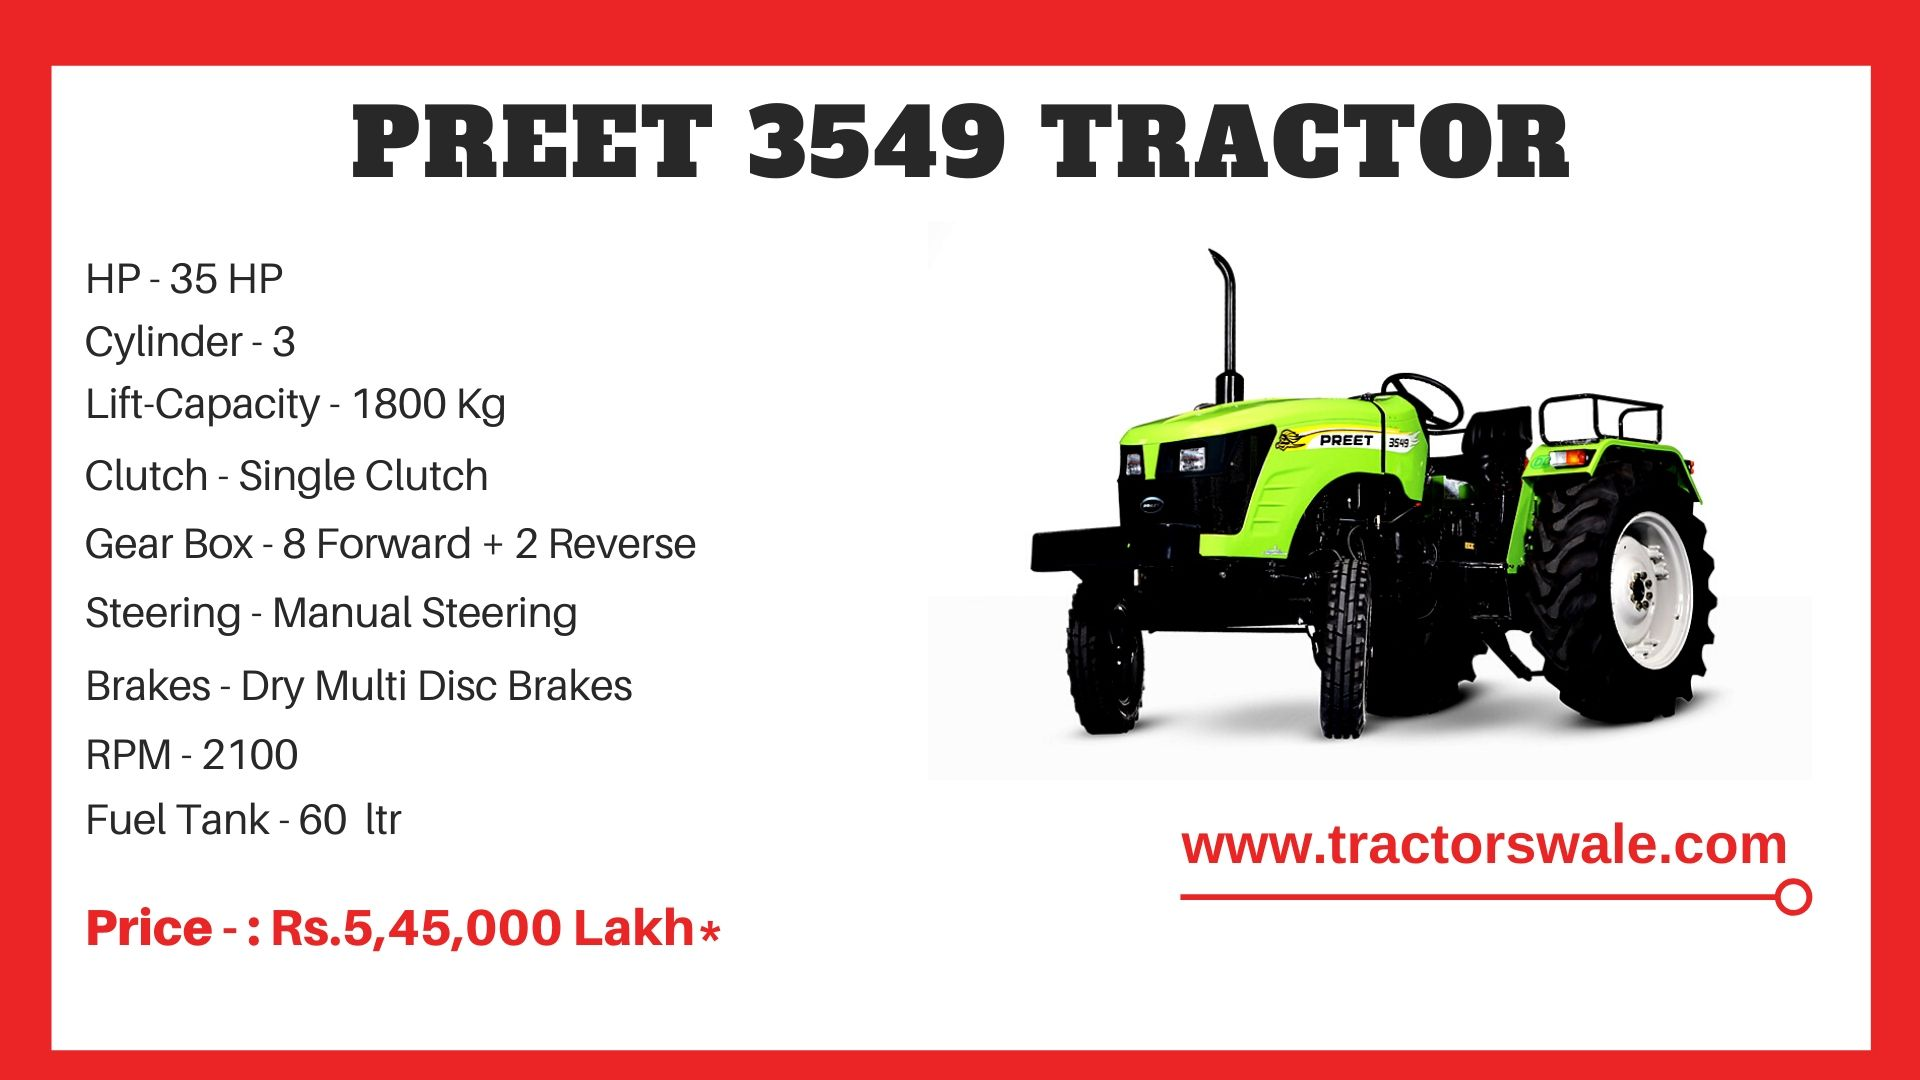 Preet 3549 tractor price